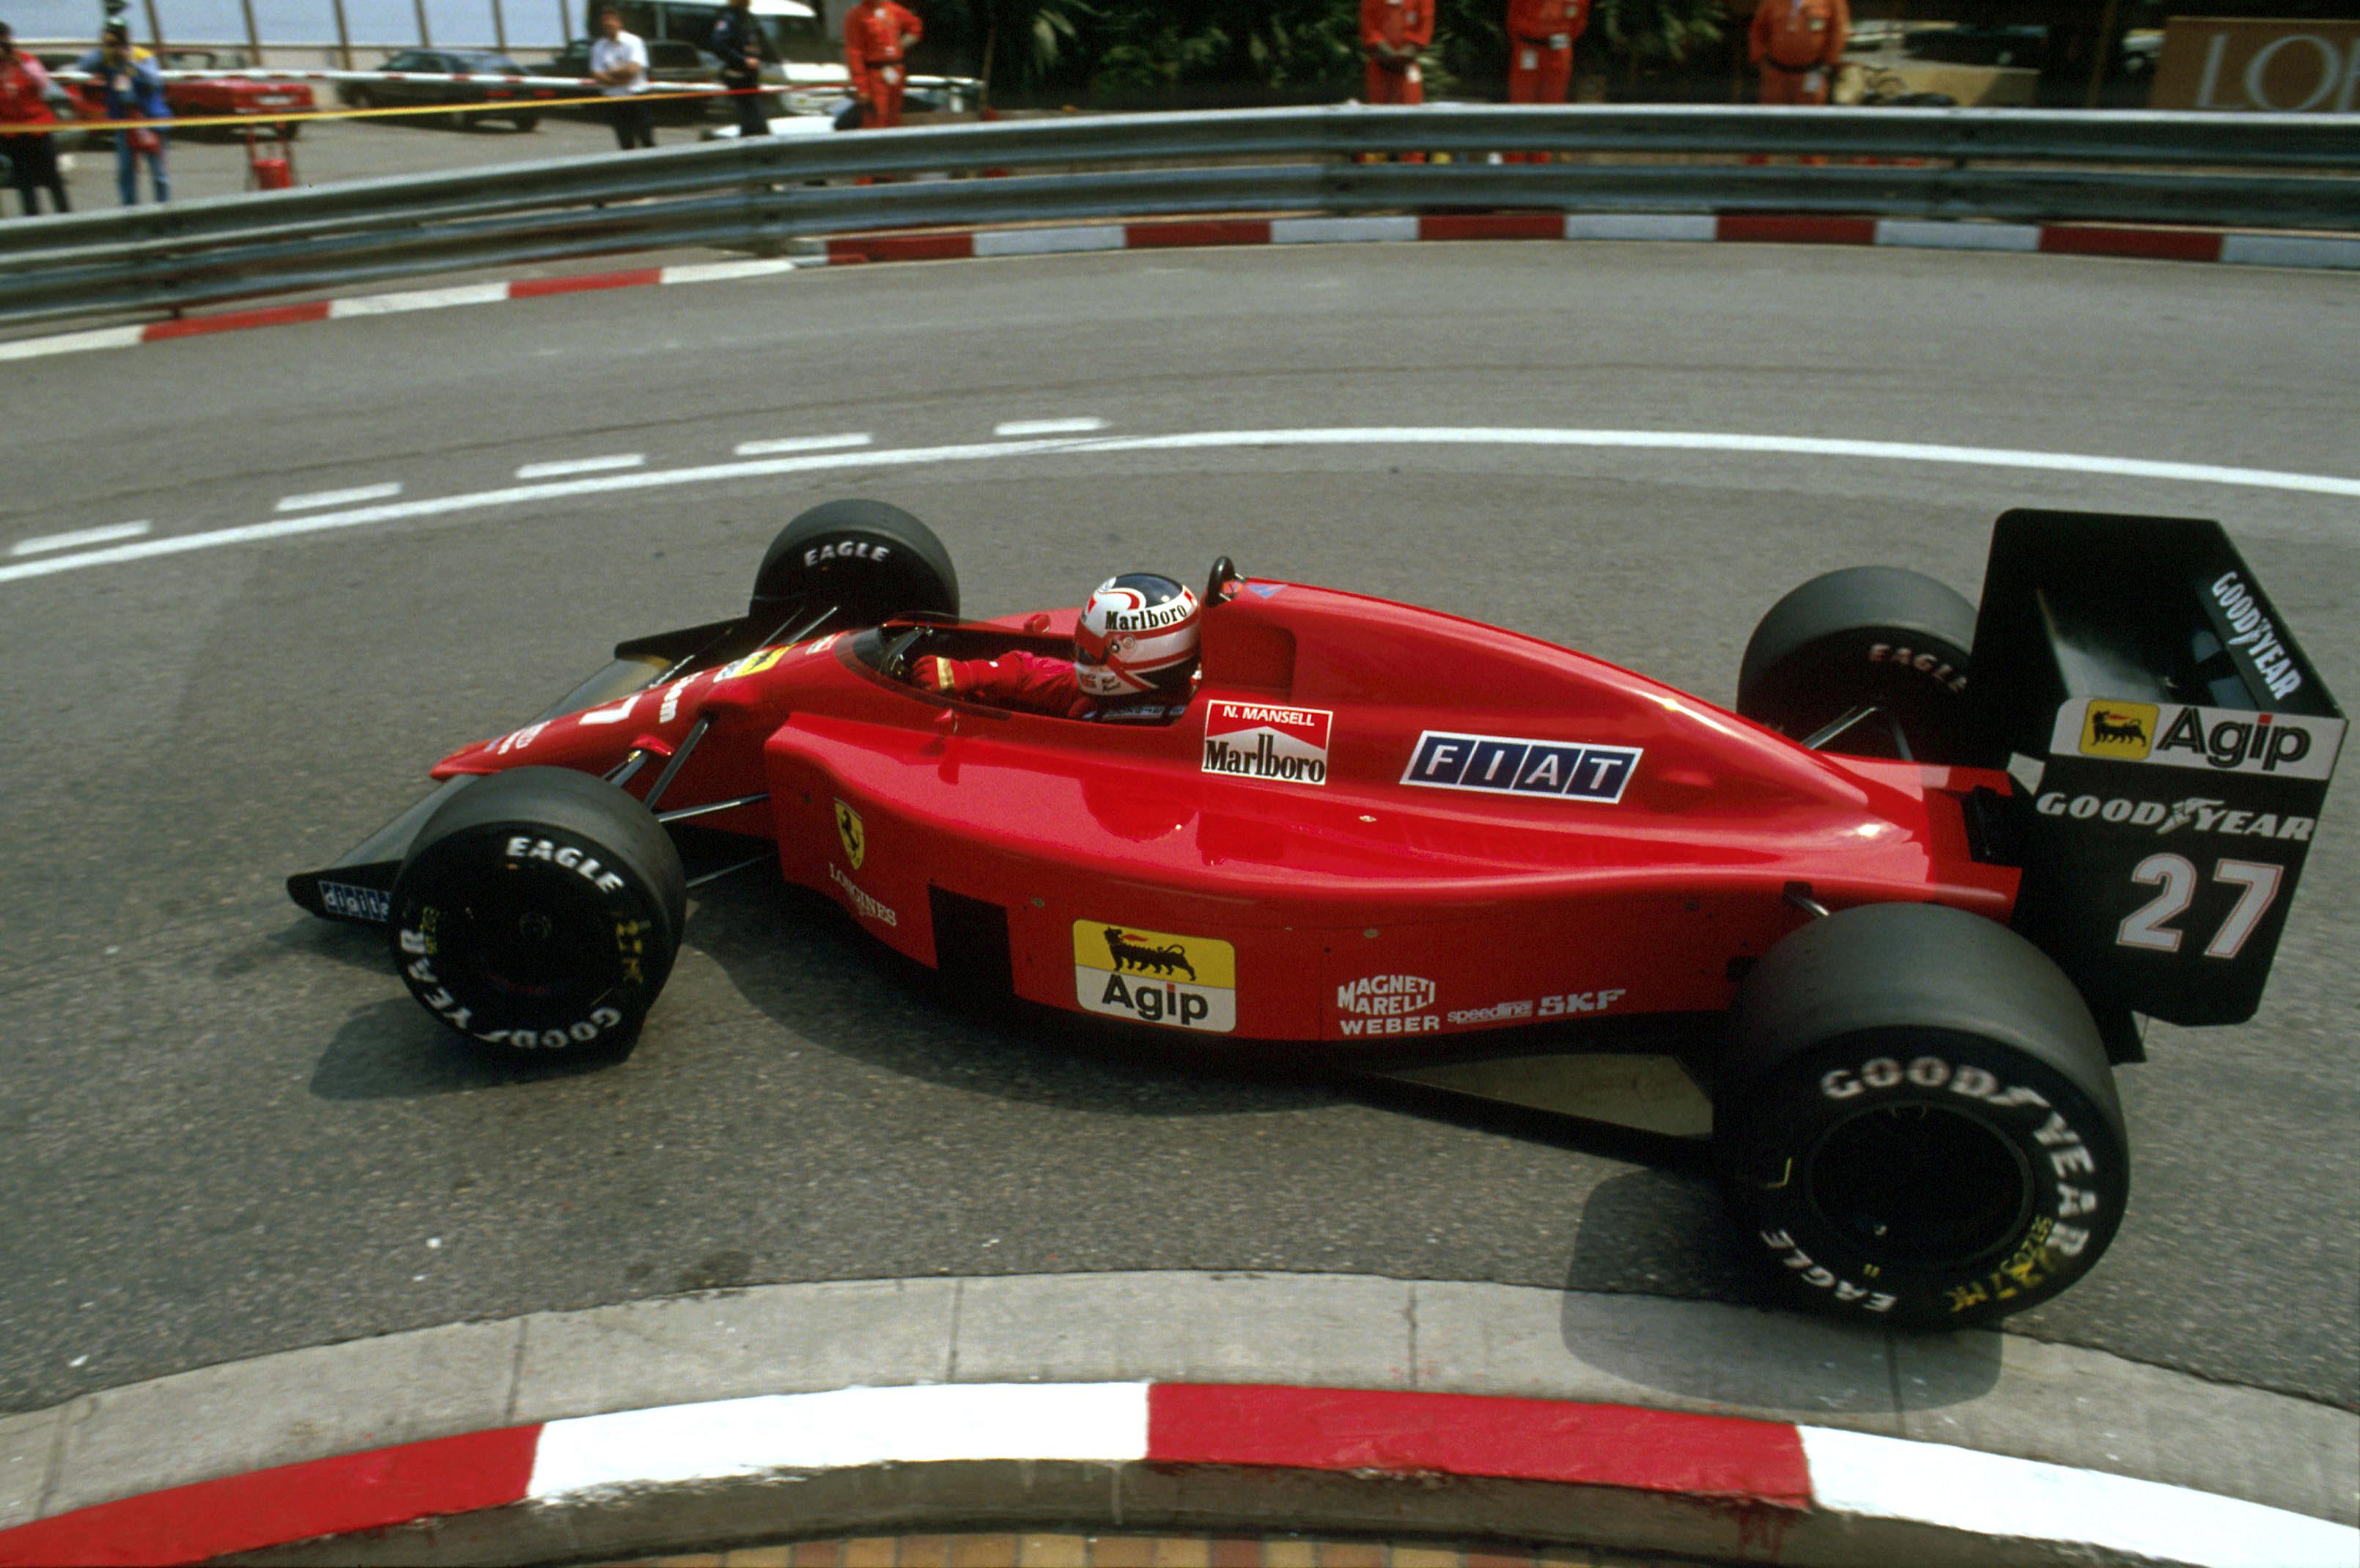 Nigel Mansell Ferrari Monaco Grand Prix 1989